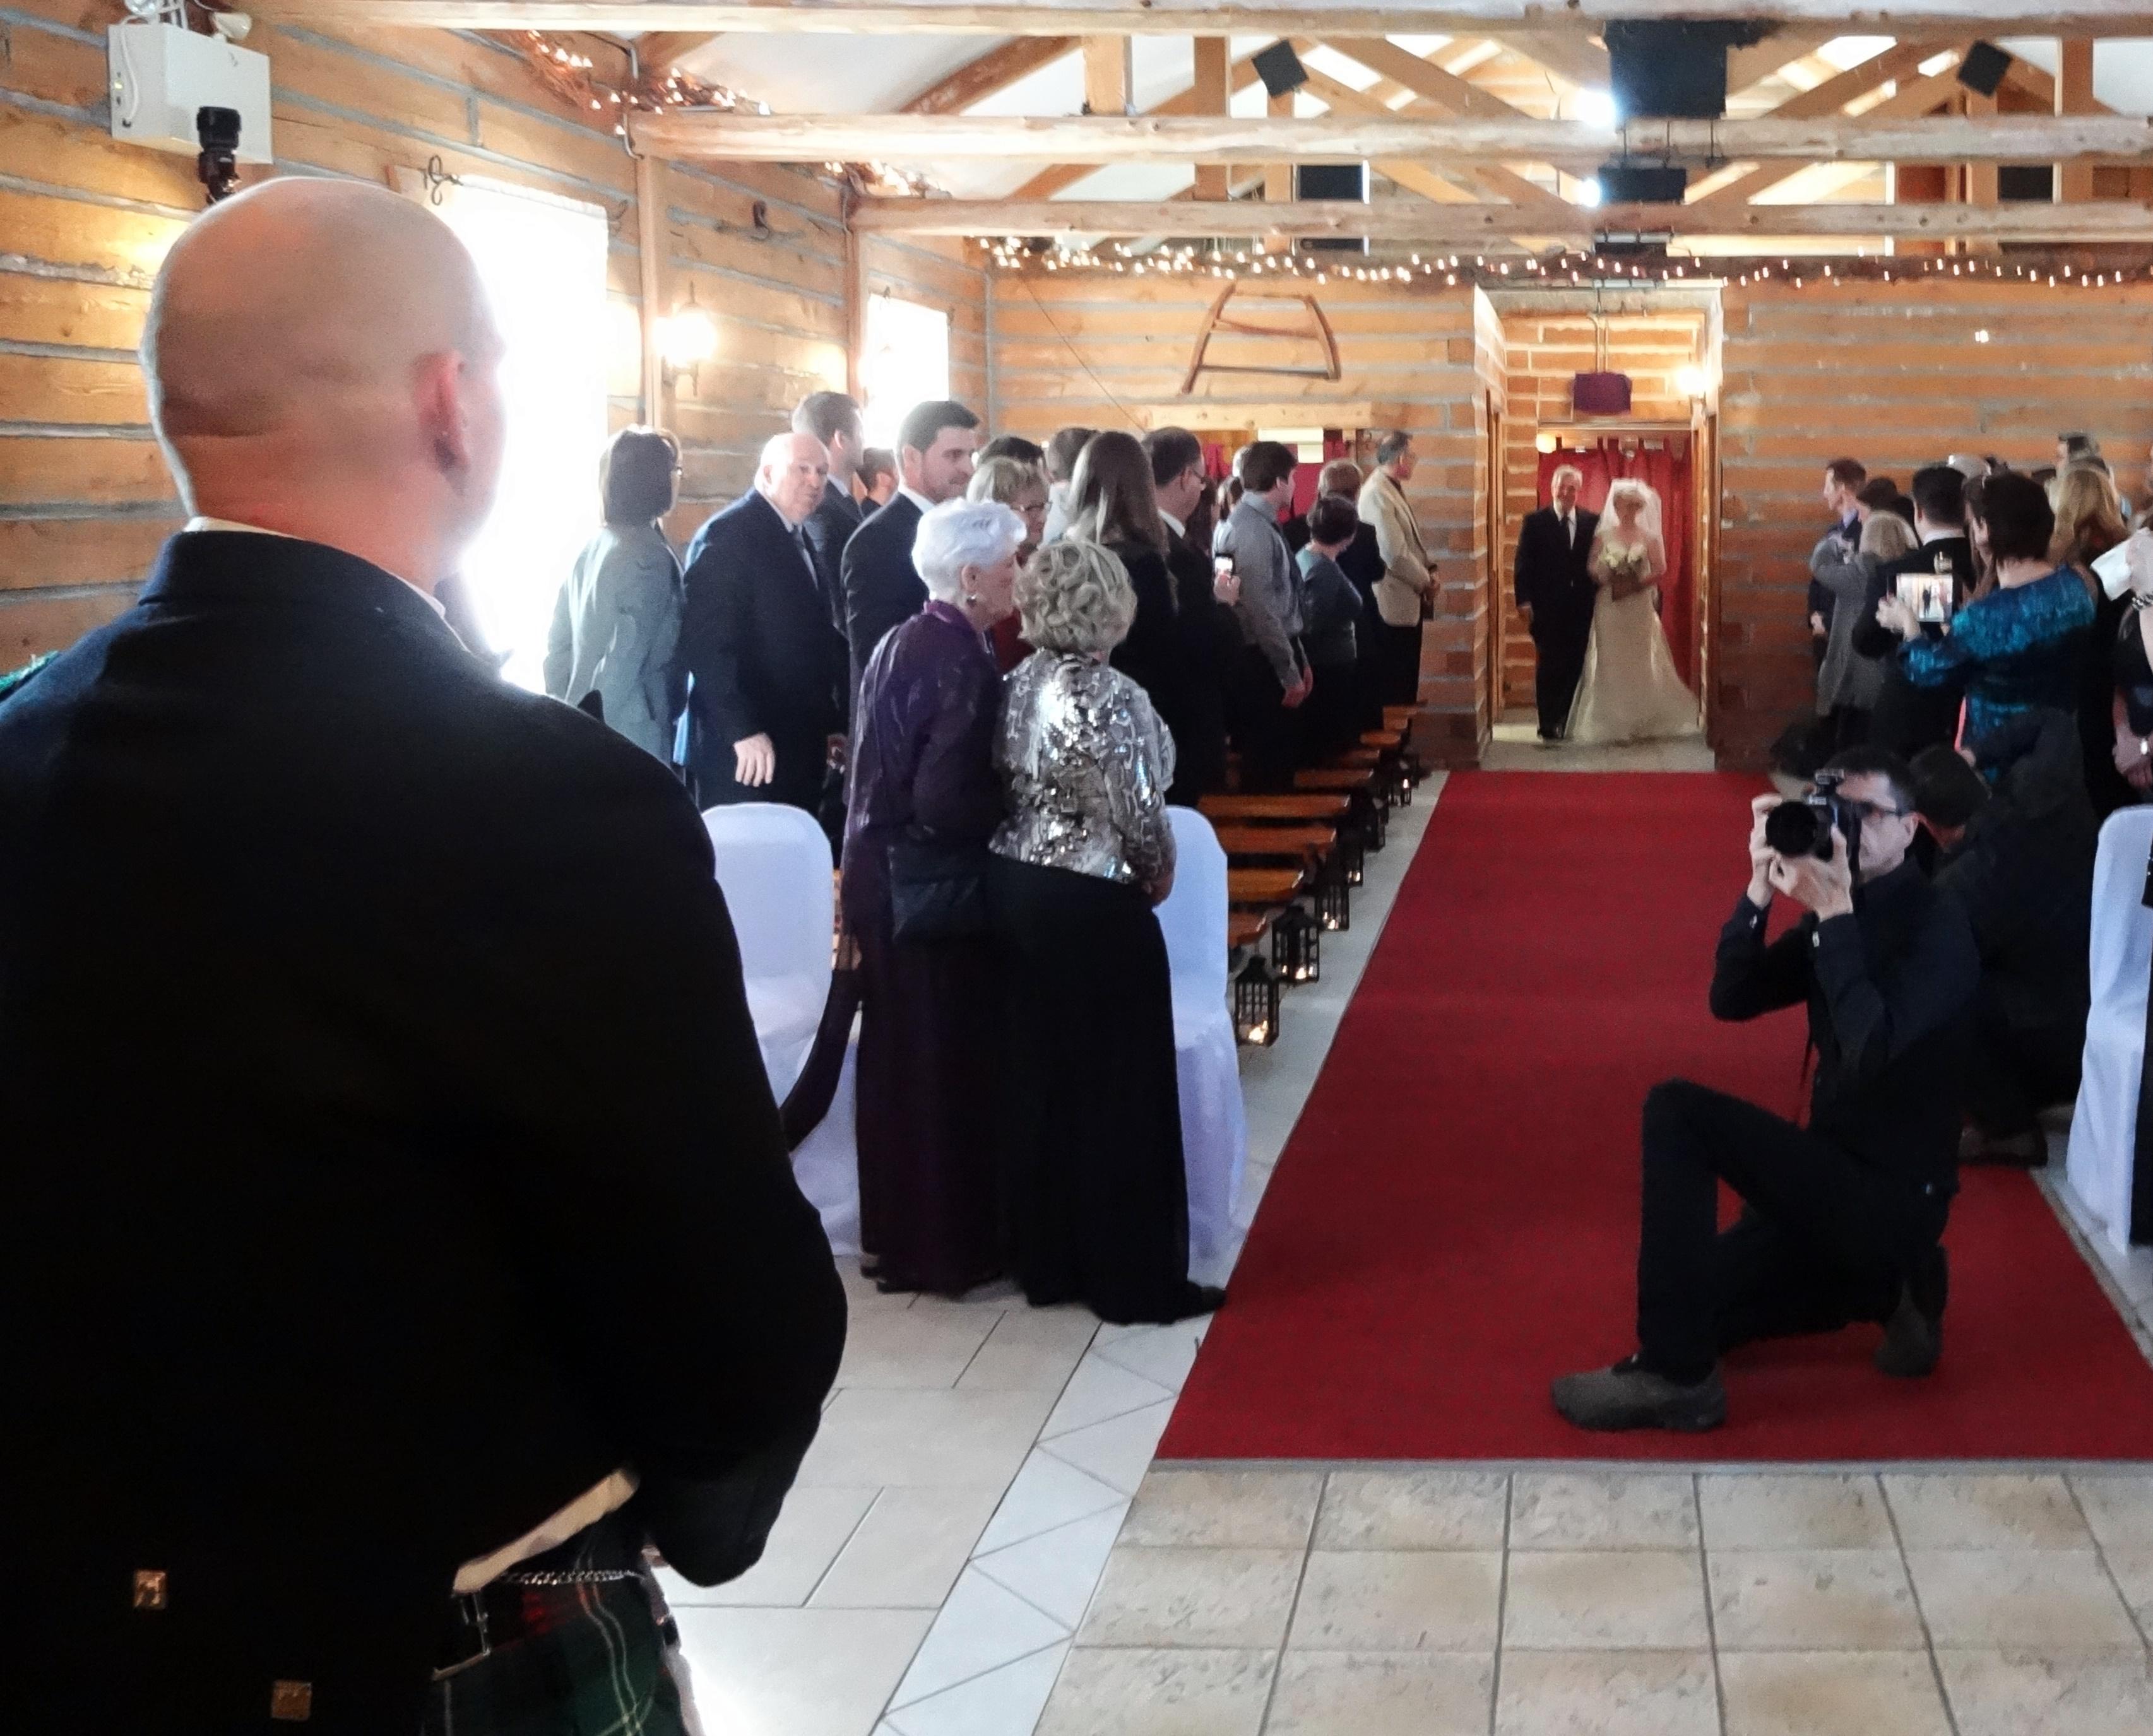 I Want A Church Wedding Without The Religion Ottawa